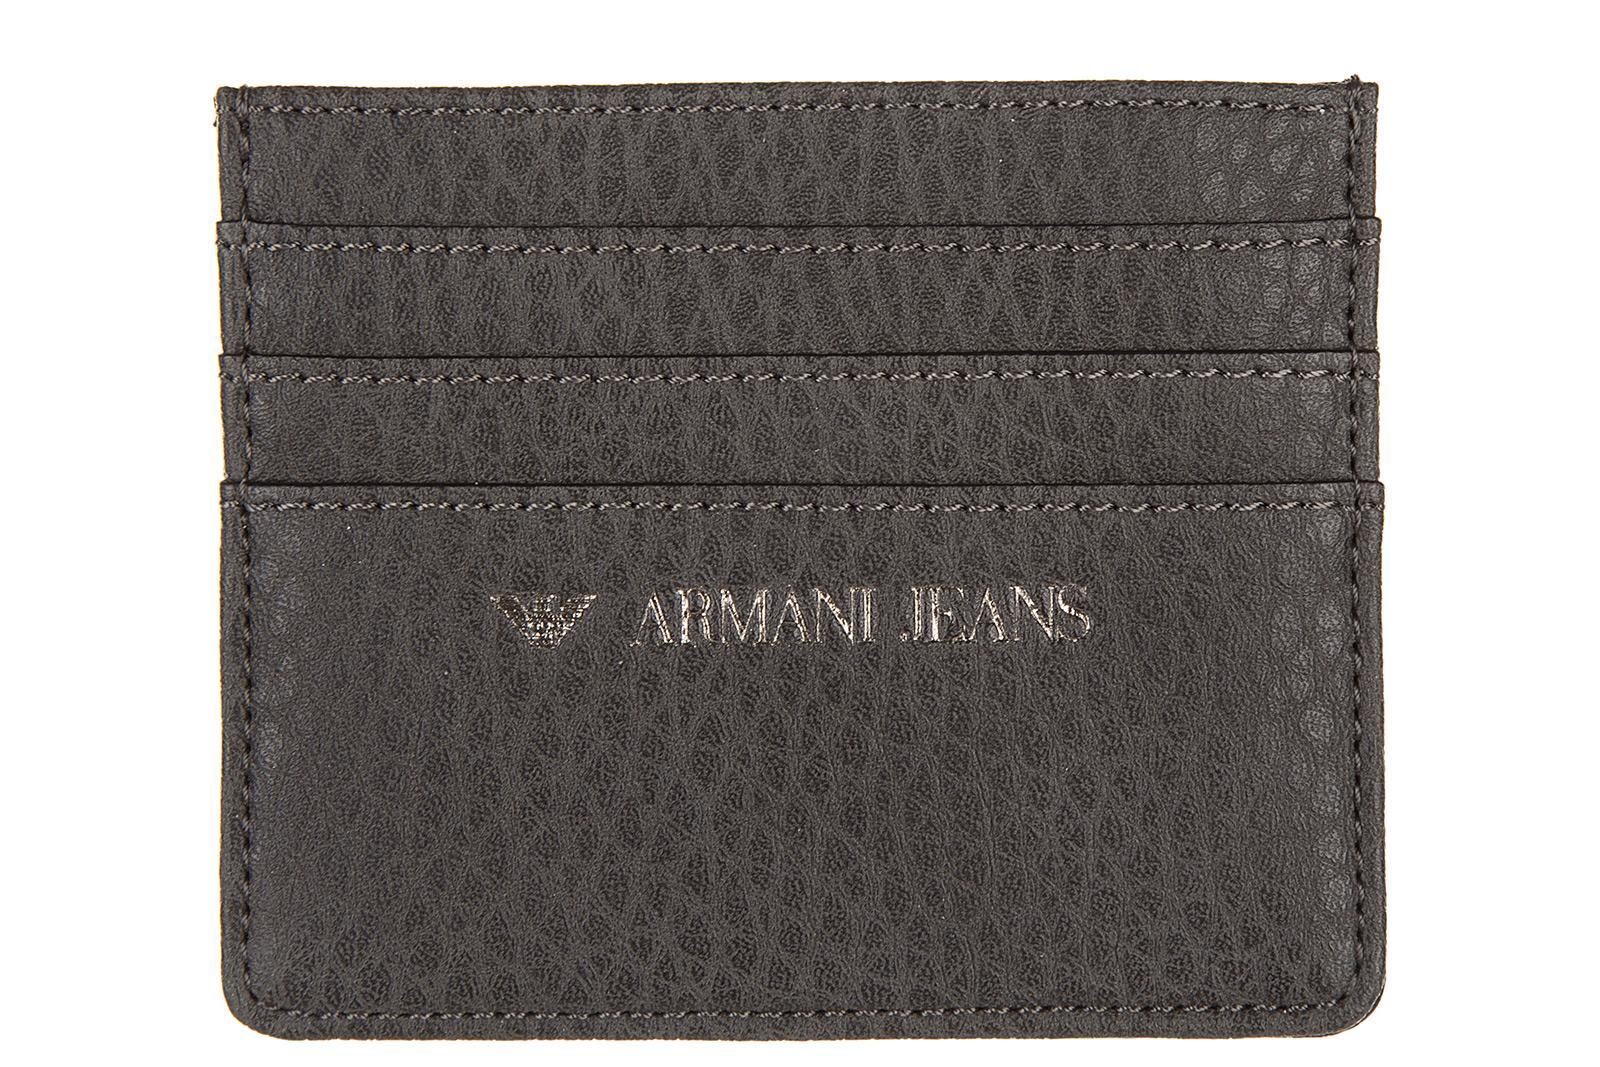 Armani Jeans Men's Credit Card Case Holder Wallet In Grey